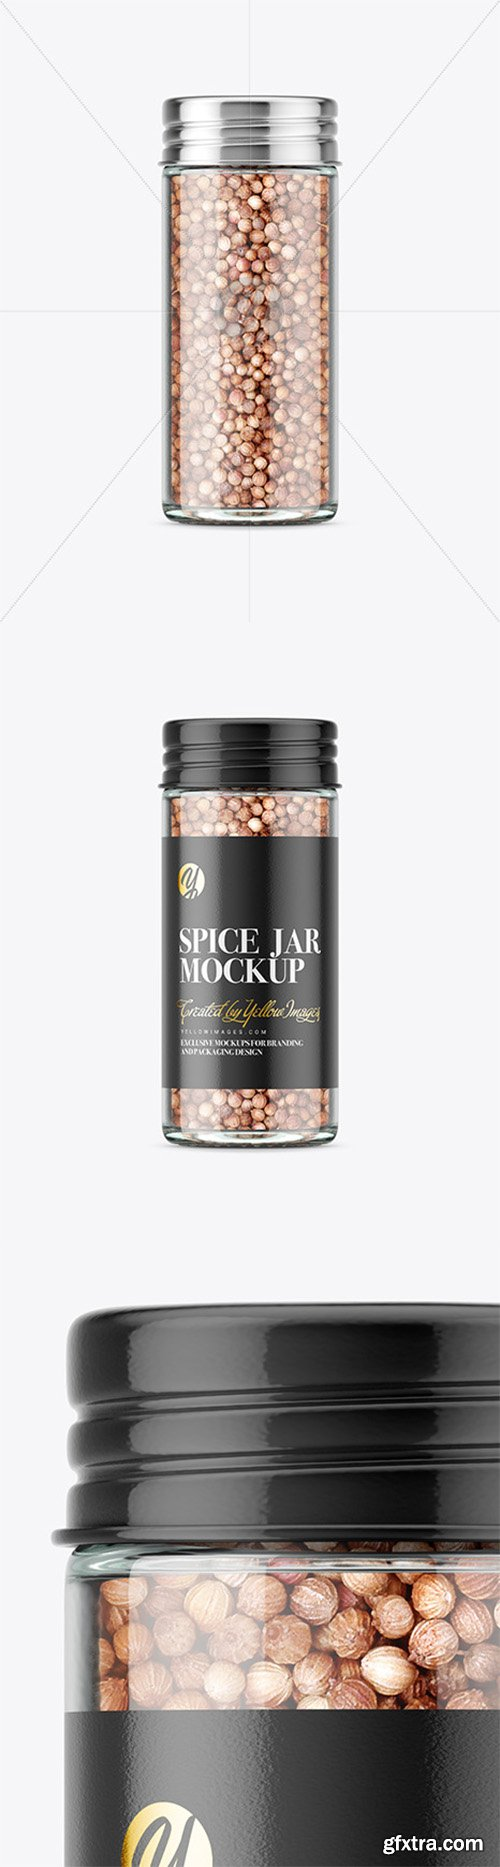 Spice Jar with Coriander Mockup 80834